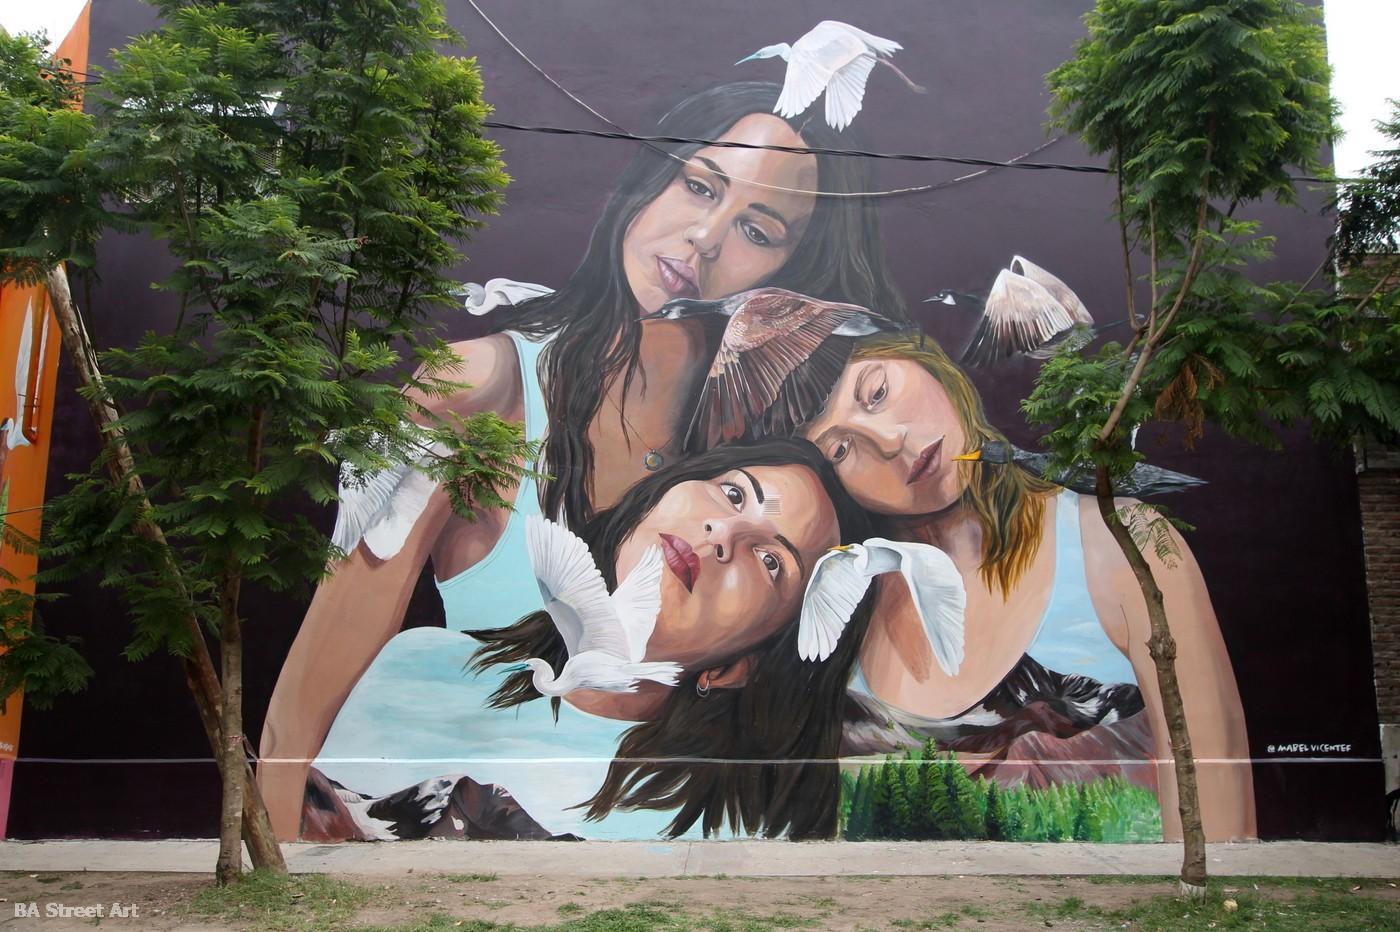 ruta de murales tour buenos aires street art graffiti mabel vicentef mujeres feminisimo derechos de mujeres arte urbano naturaleza